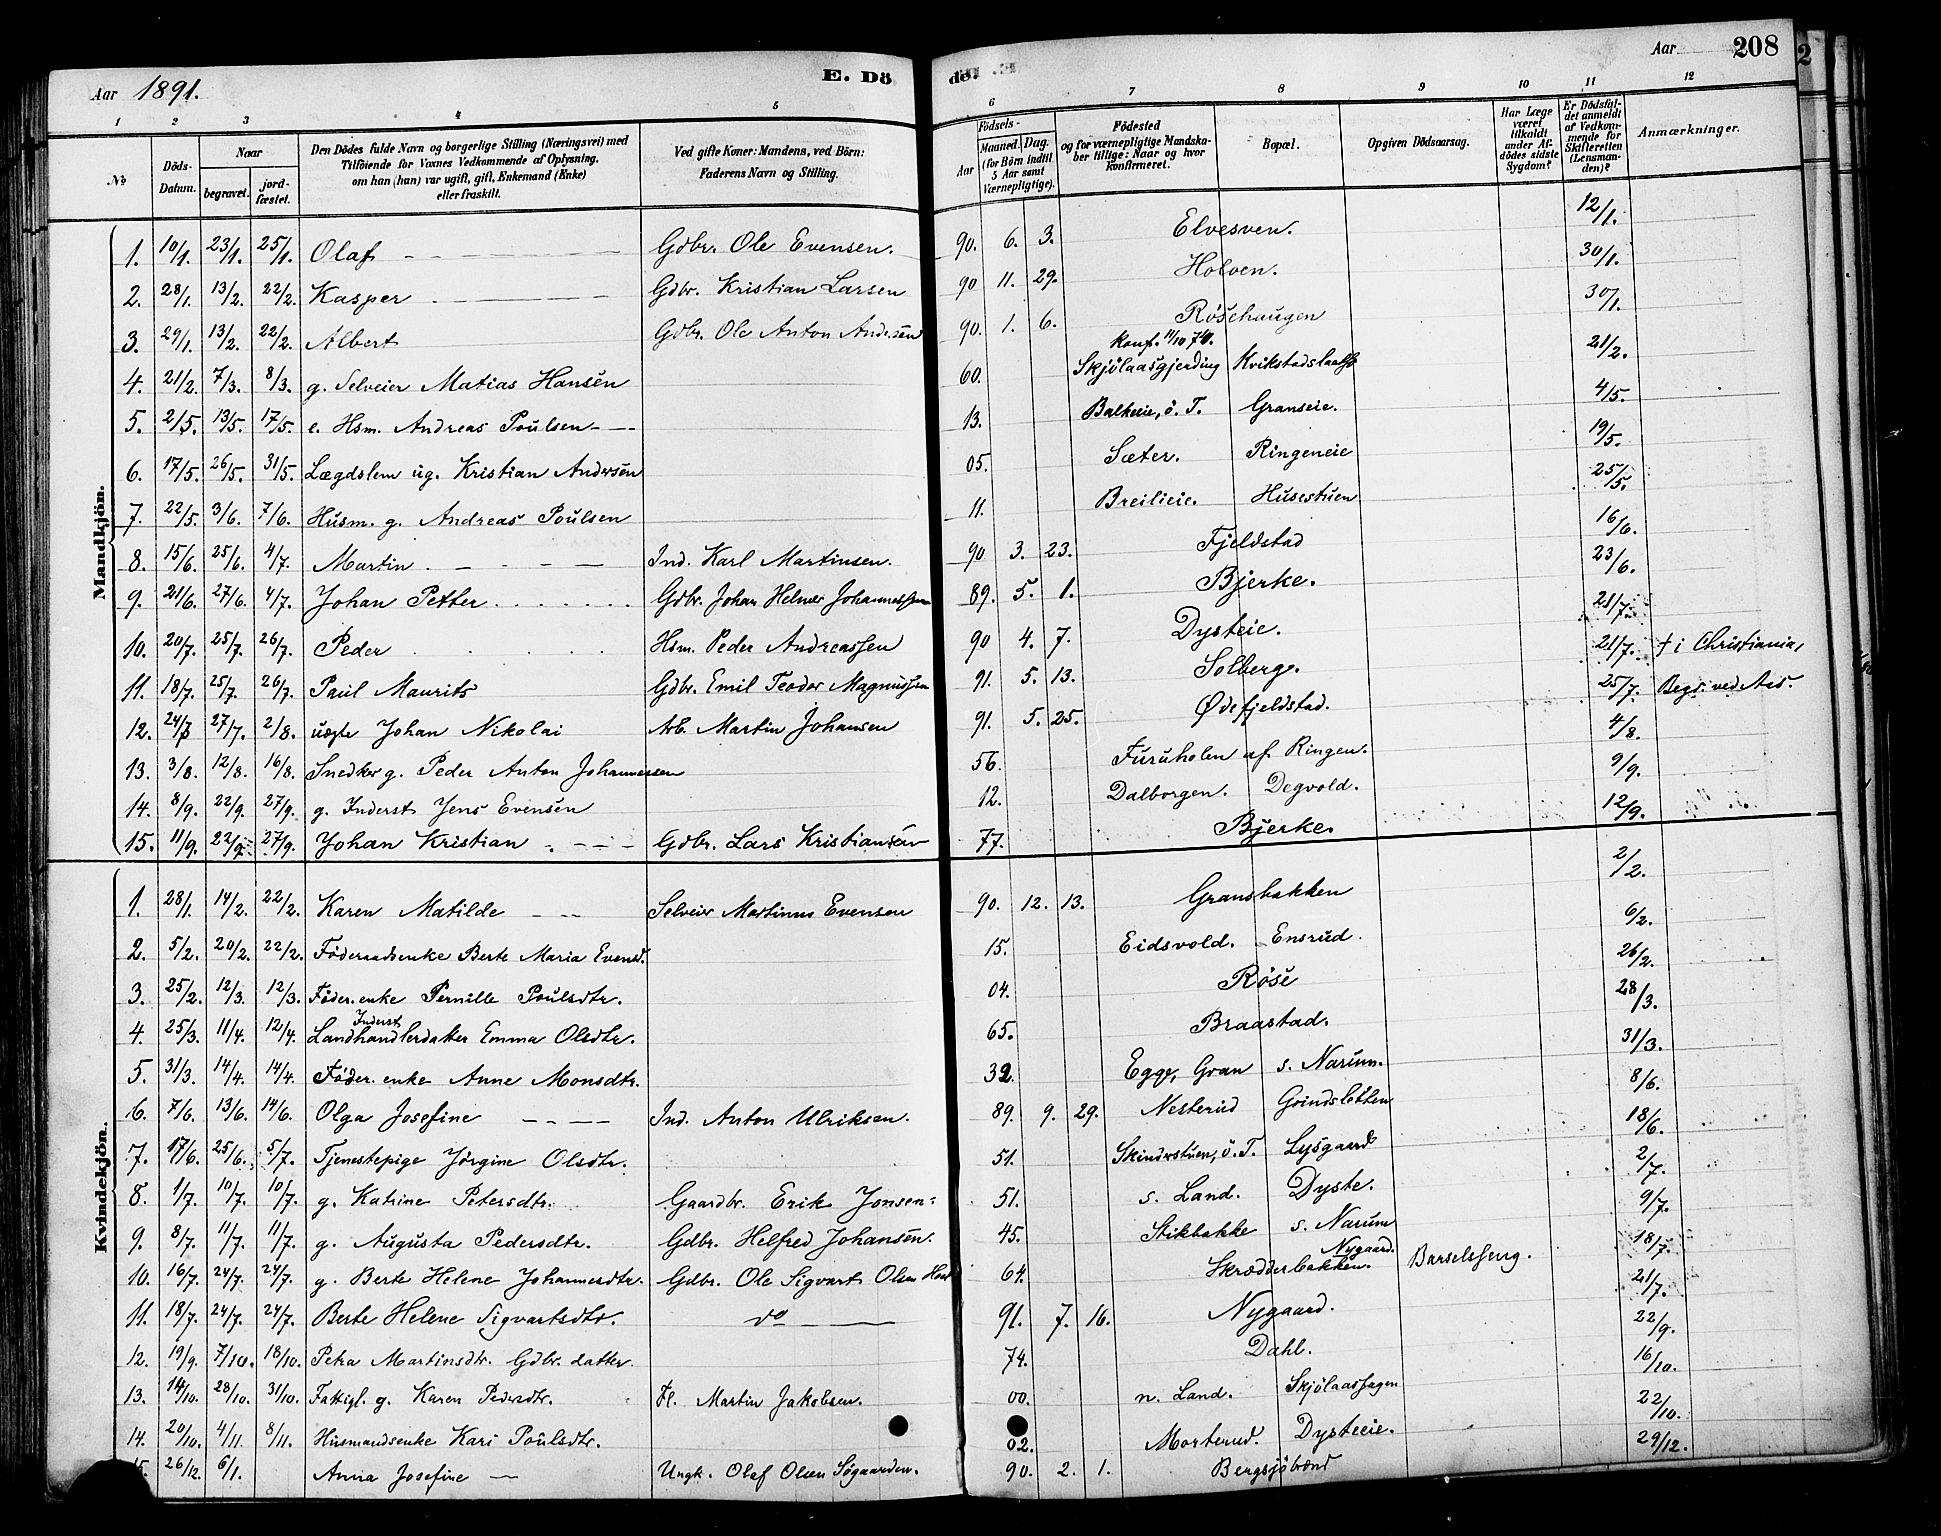 SAH, Vestre Toten prestekontor, H/Ha/Haa/L0010: Ministerialbok nr. 10, 1878-1894, s. 208